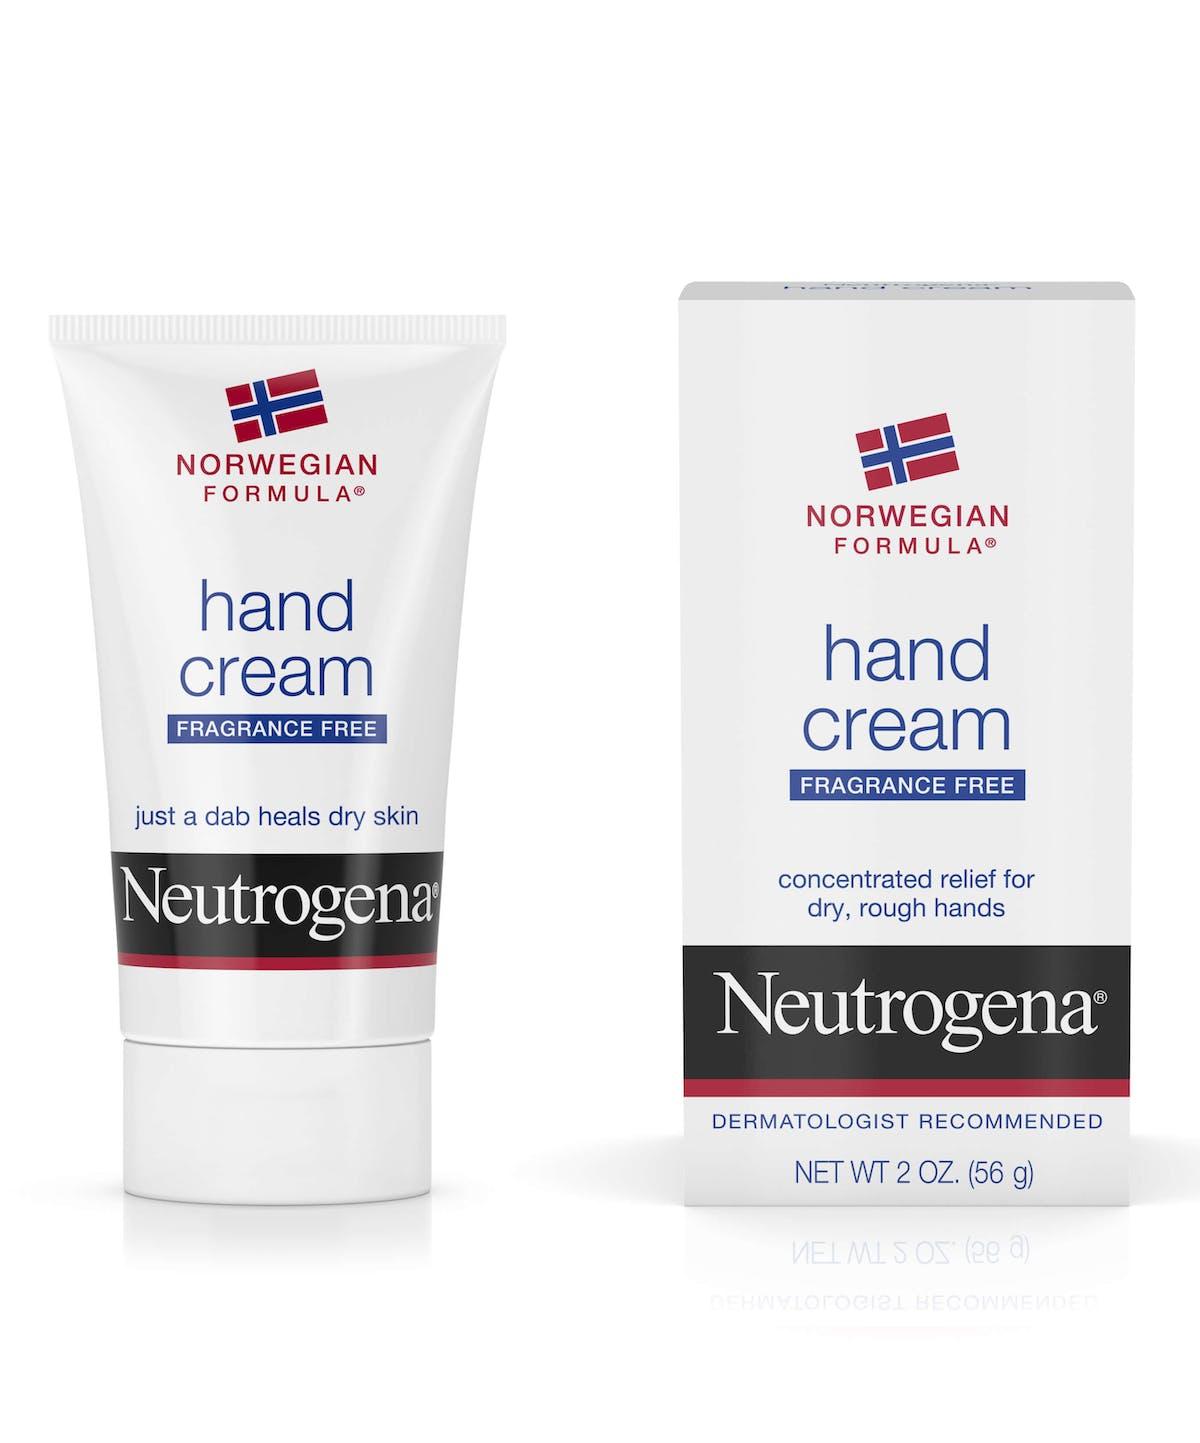 8603b42051d Norwegian Formula reg  Hand Cream  Norwegian Formula reg  ...